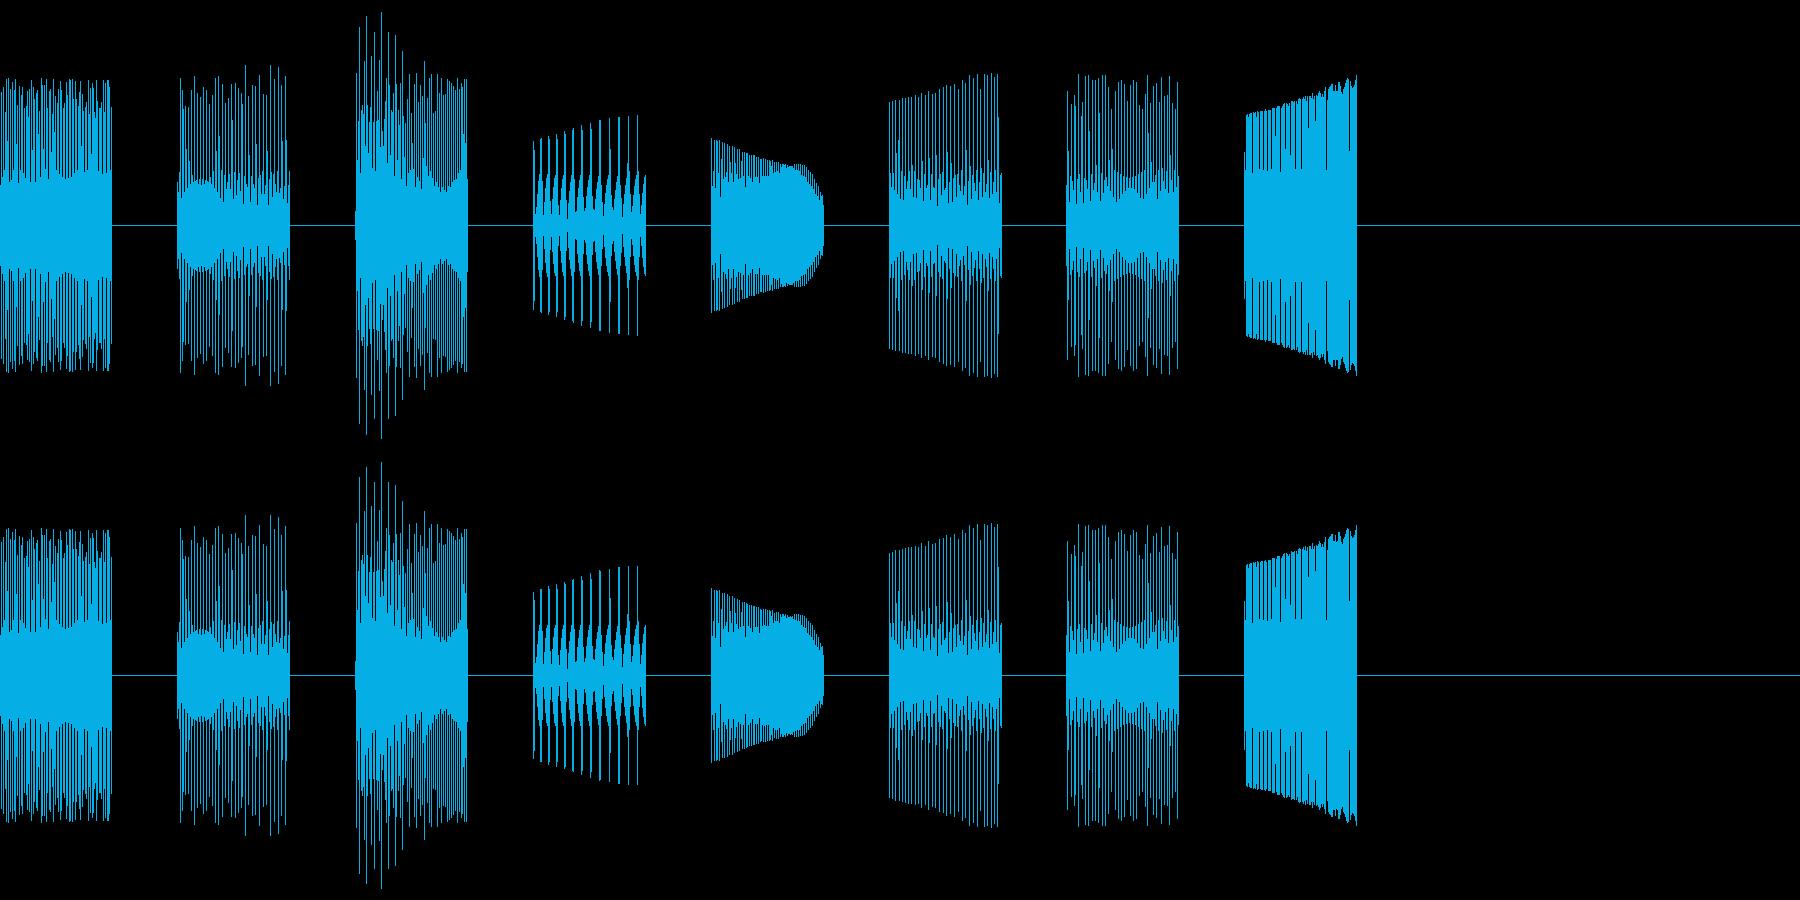 KANTピコ自主規制音3shortの再生済みの波形